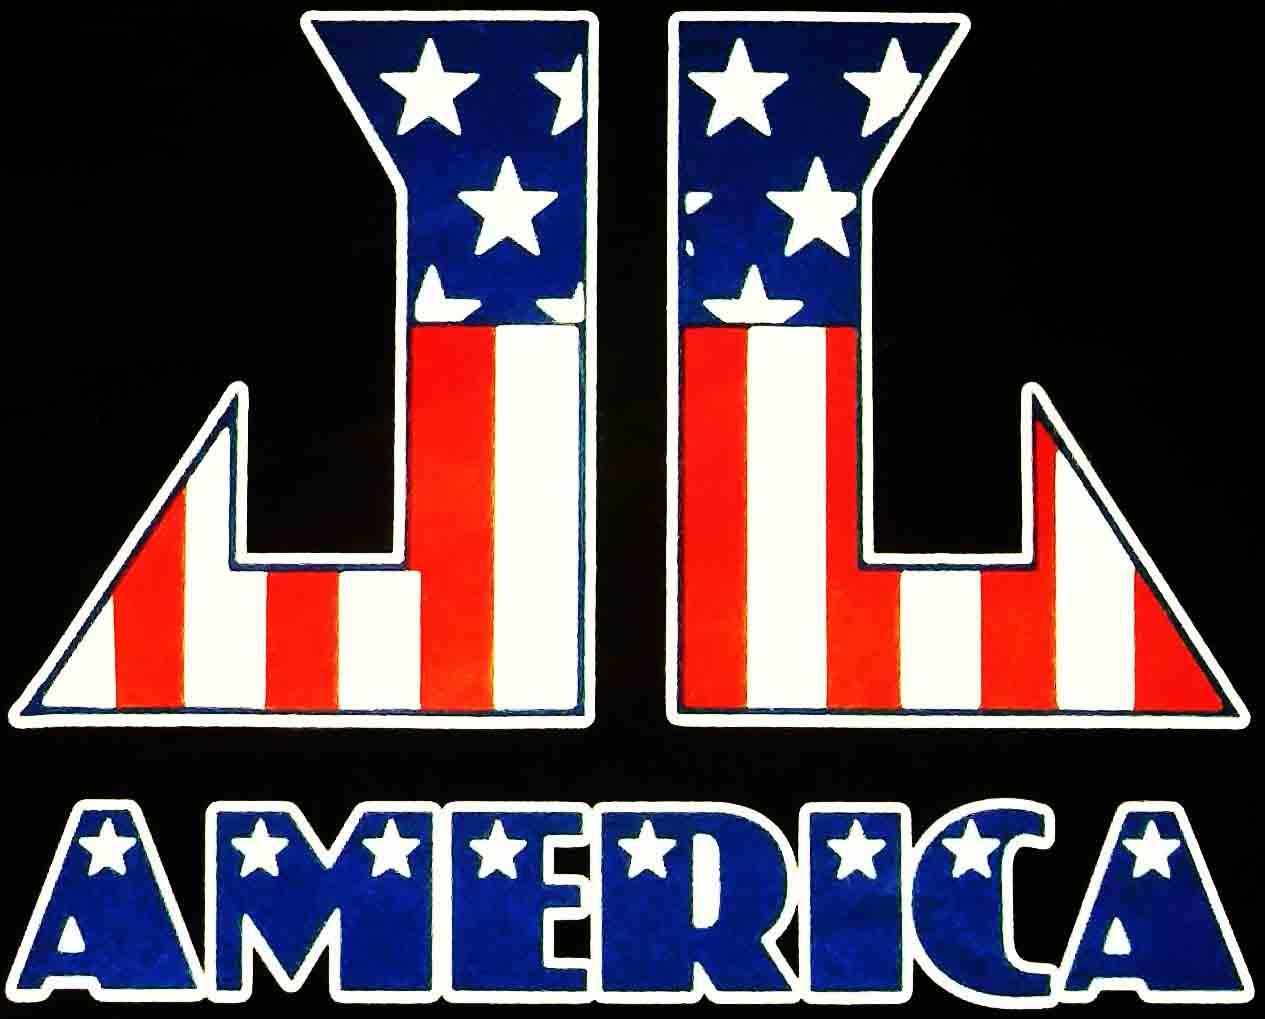 JL America